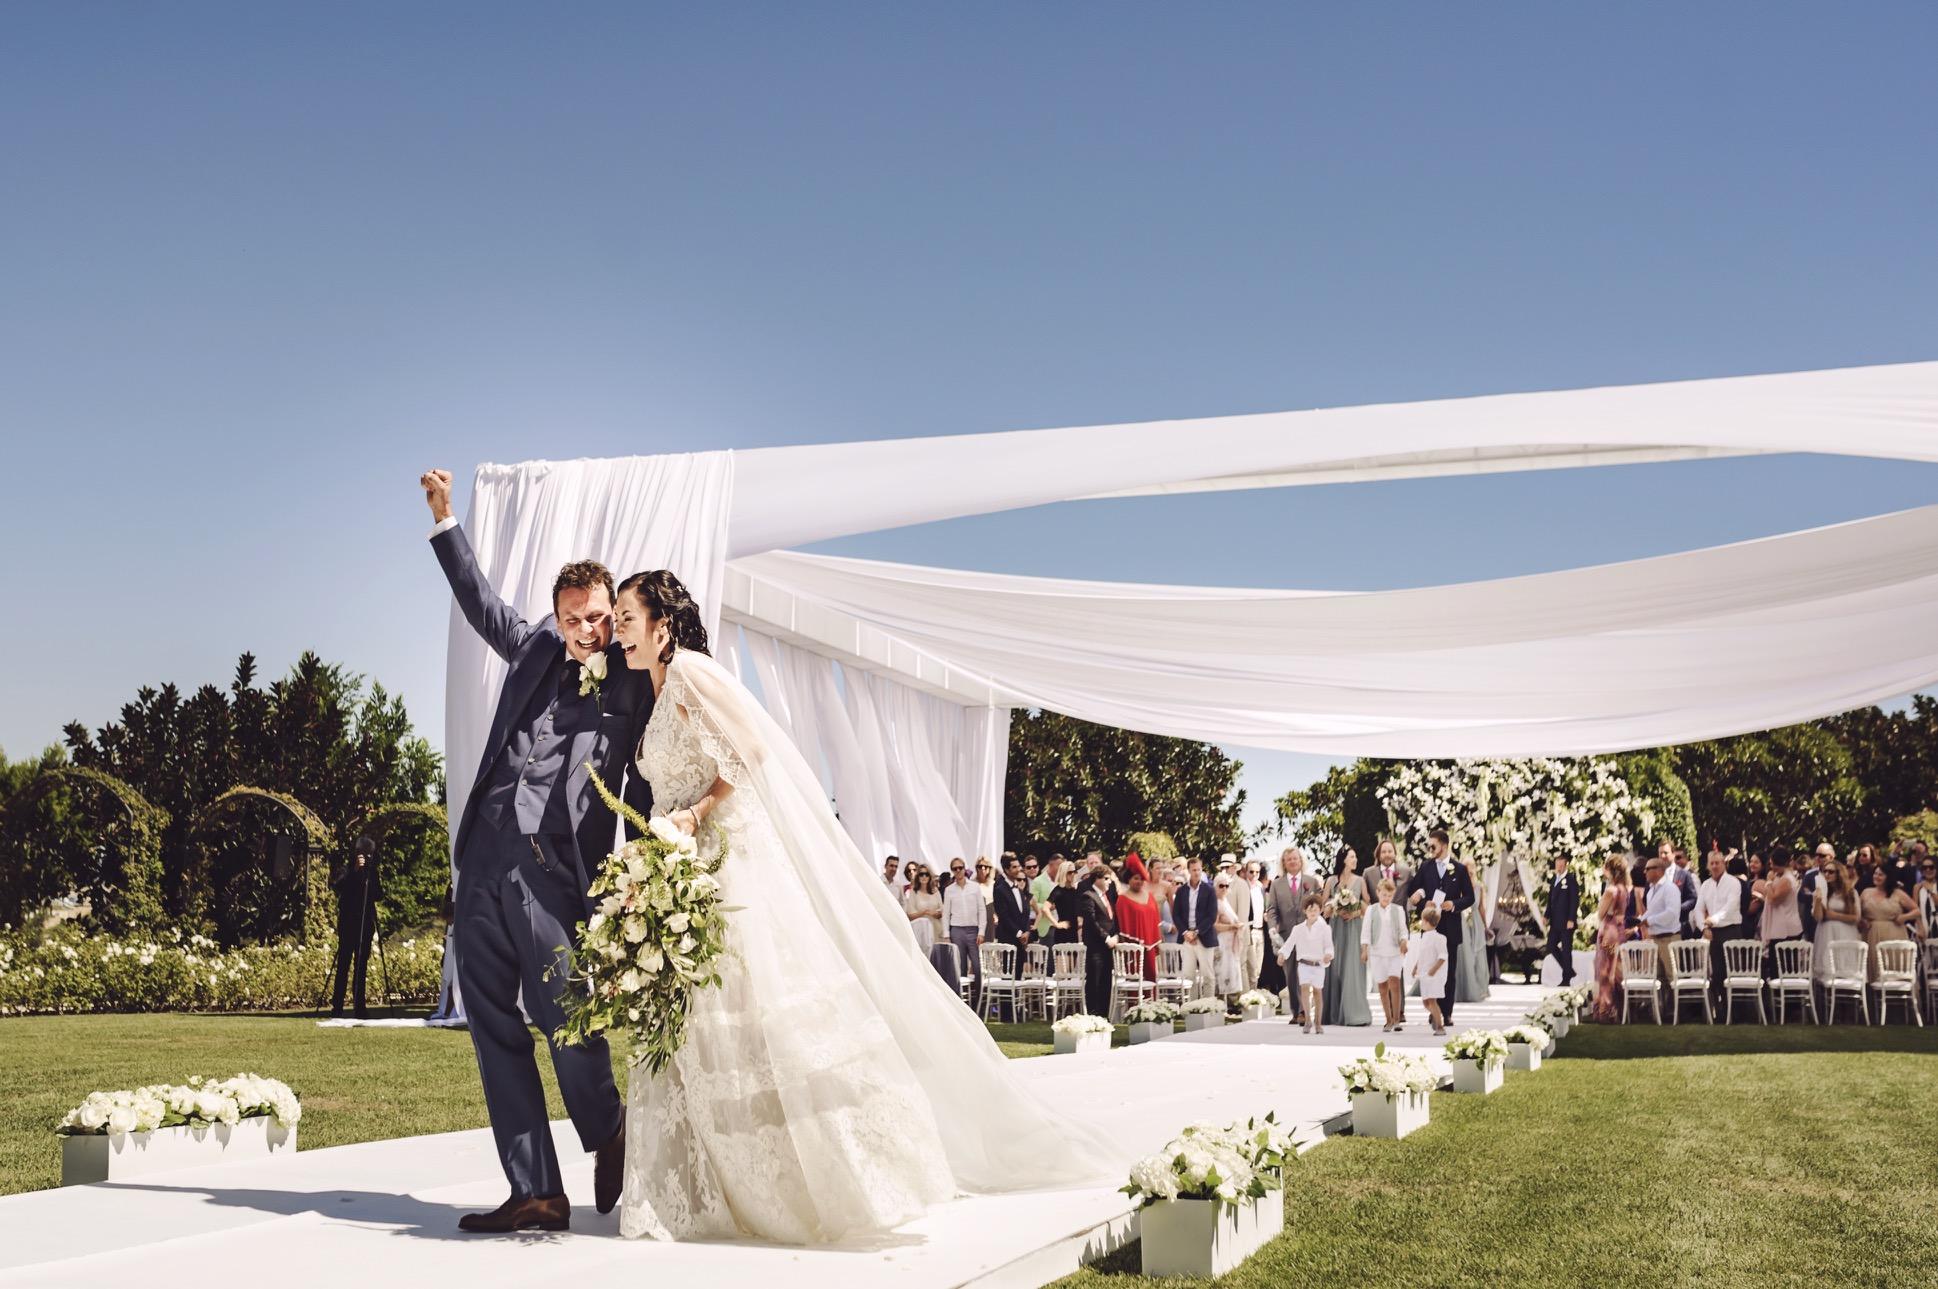 Si-Quiero-Wedding-Planner-By-Sira-Antequera-Bodas-Málaga-Marbella-Miami- Michelle-Walter-2